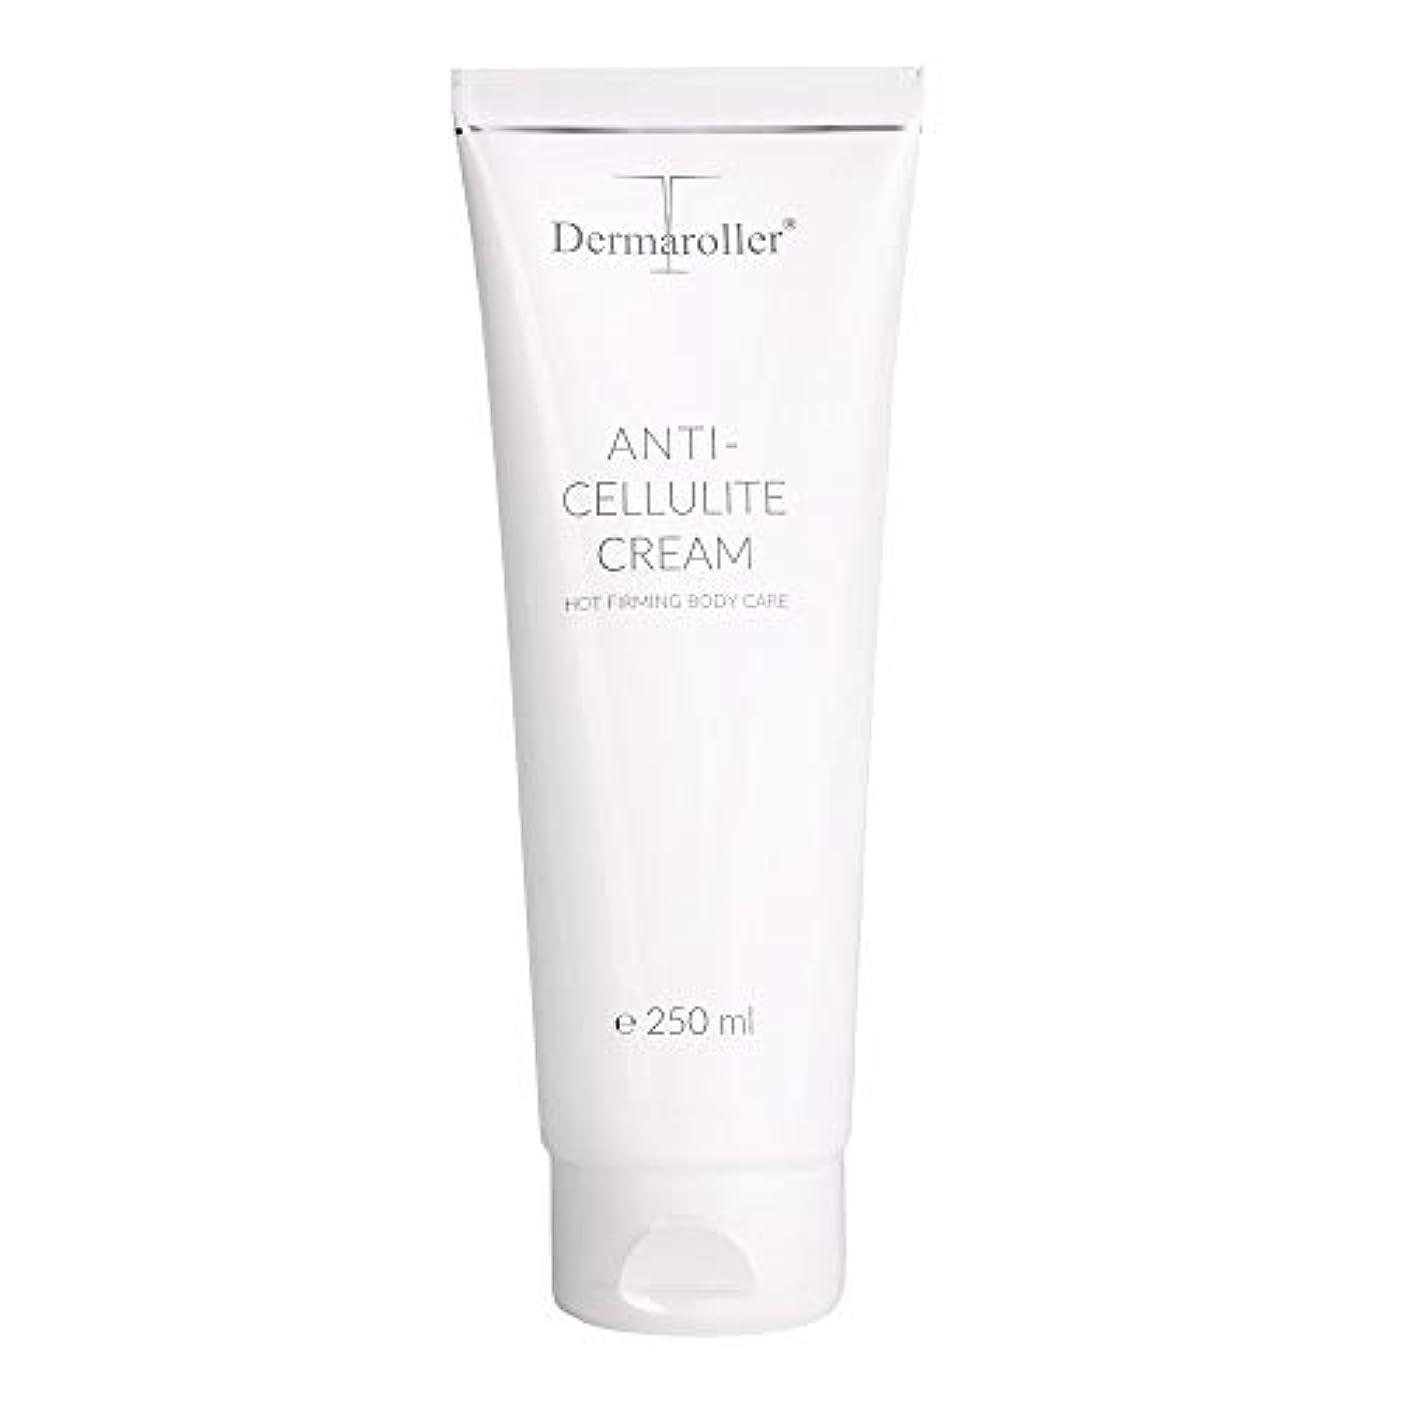 Dermaroller アンチ セルライト クリーム 250ml [Dermaroller]Anti-Cellulite Cream